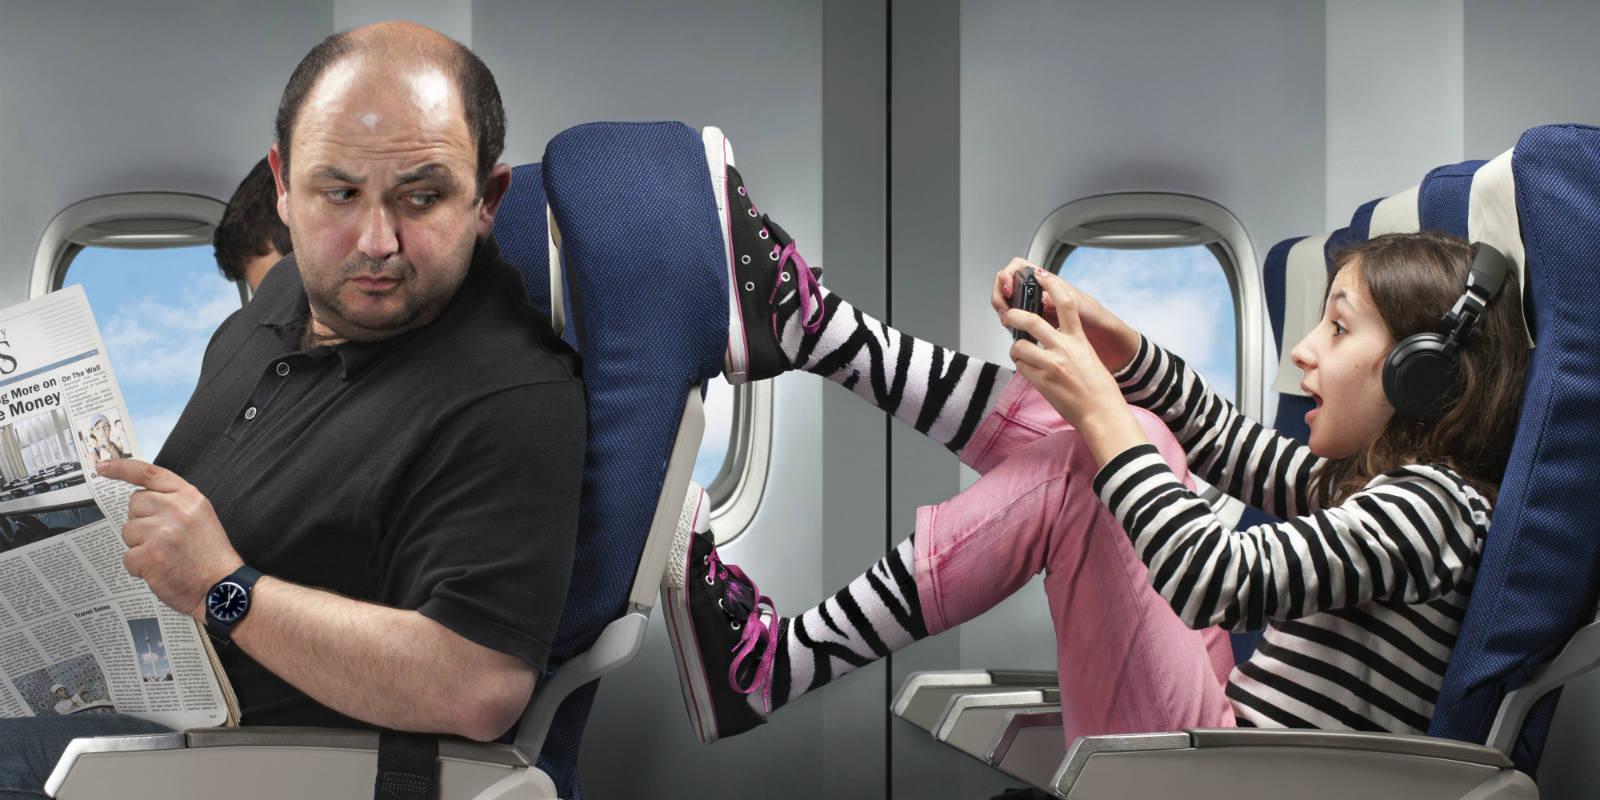 Цена билета на самолет для ребенка 2 где в дзержинске купить билет на самолет